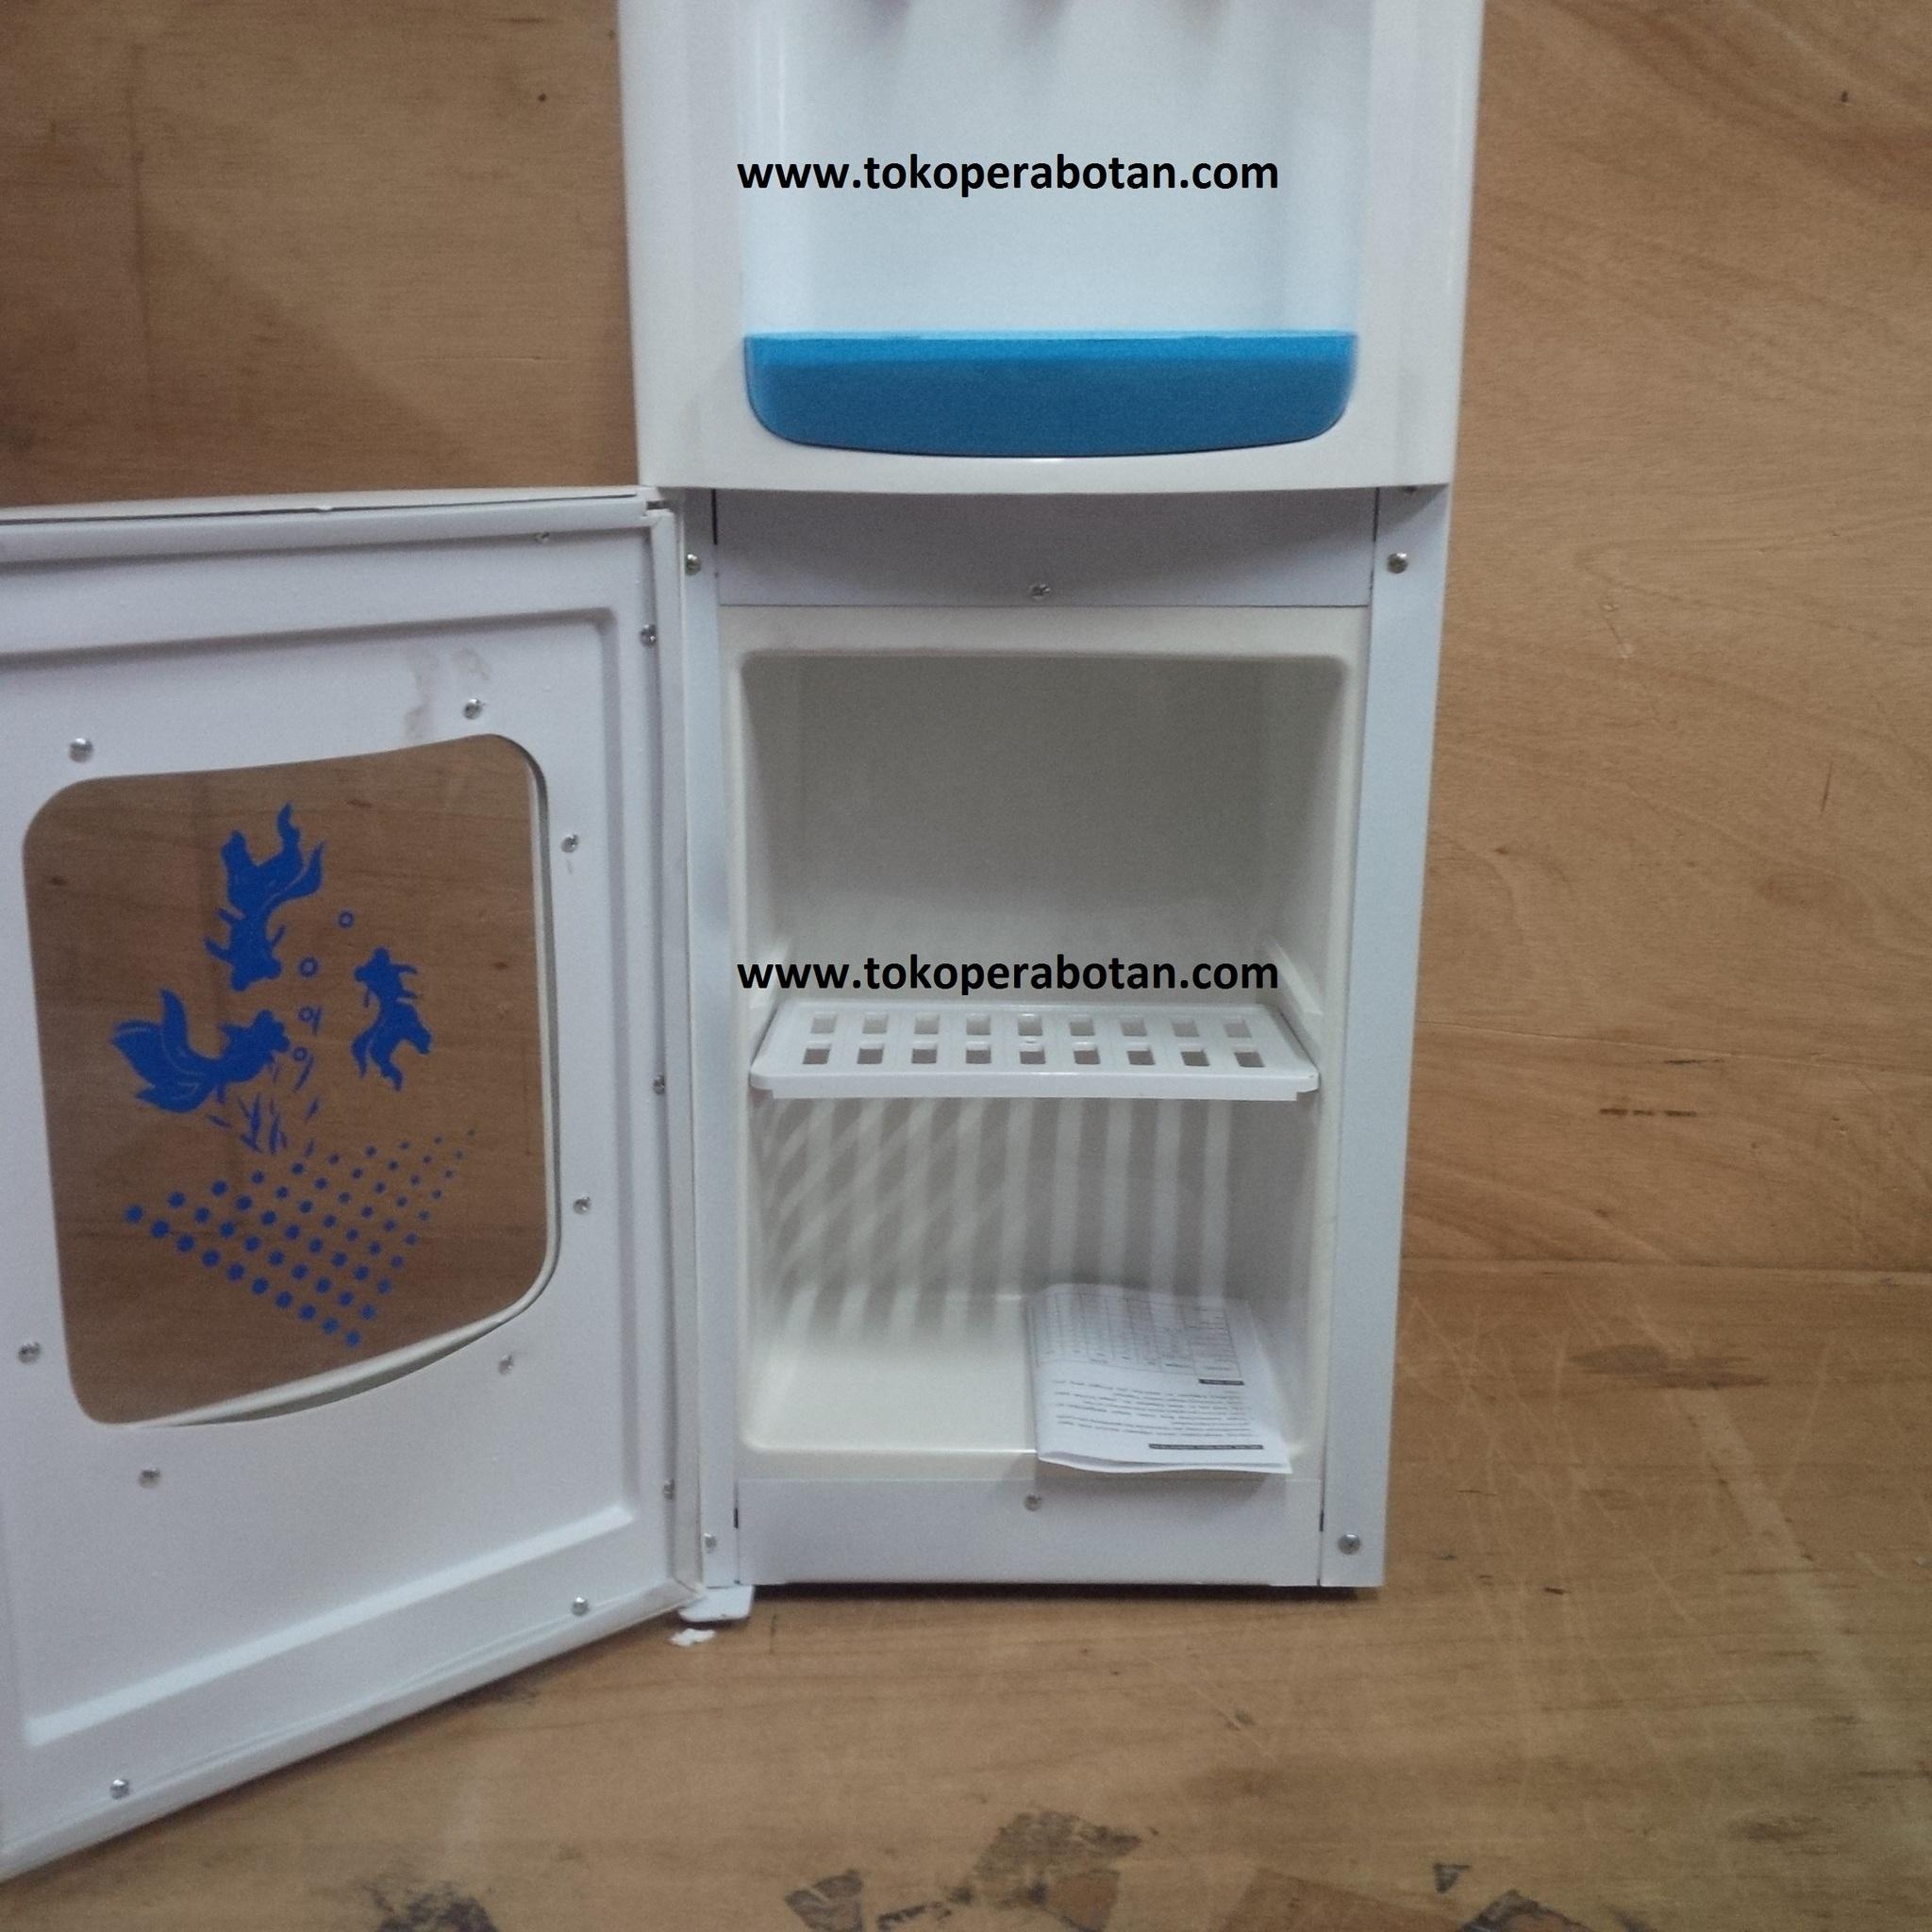 Sanex D 302 Dispenser Tinggi 3 Kran Panas Normal Dingin Putih Galon D102 102 Hot Dan Garansi